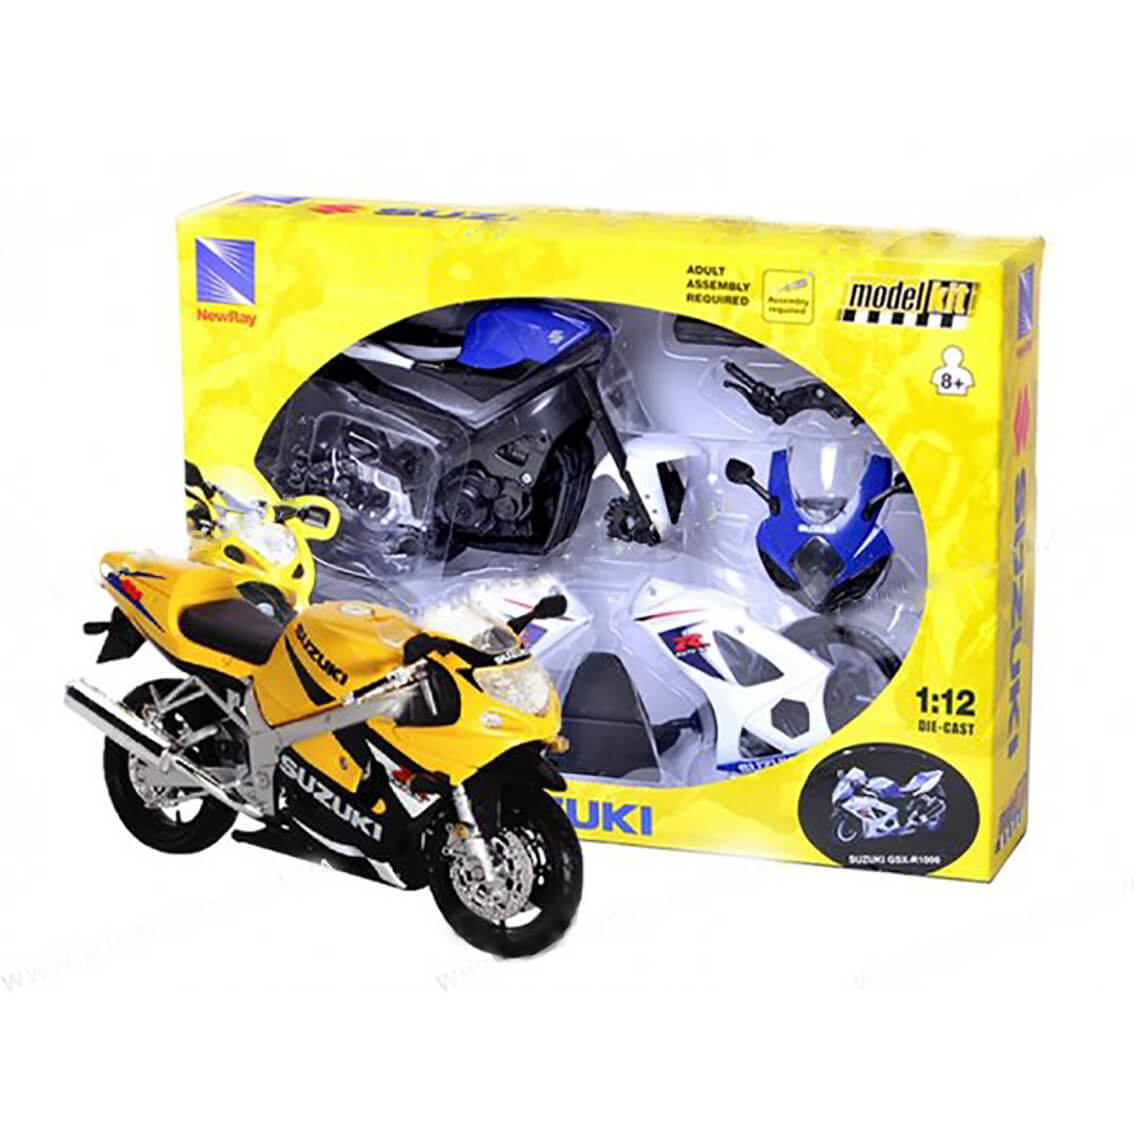 Мотоцикл SUZUKI 57005